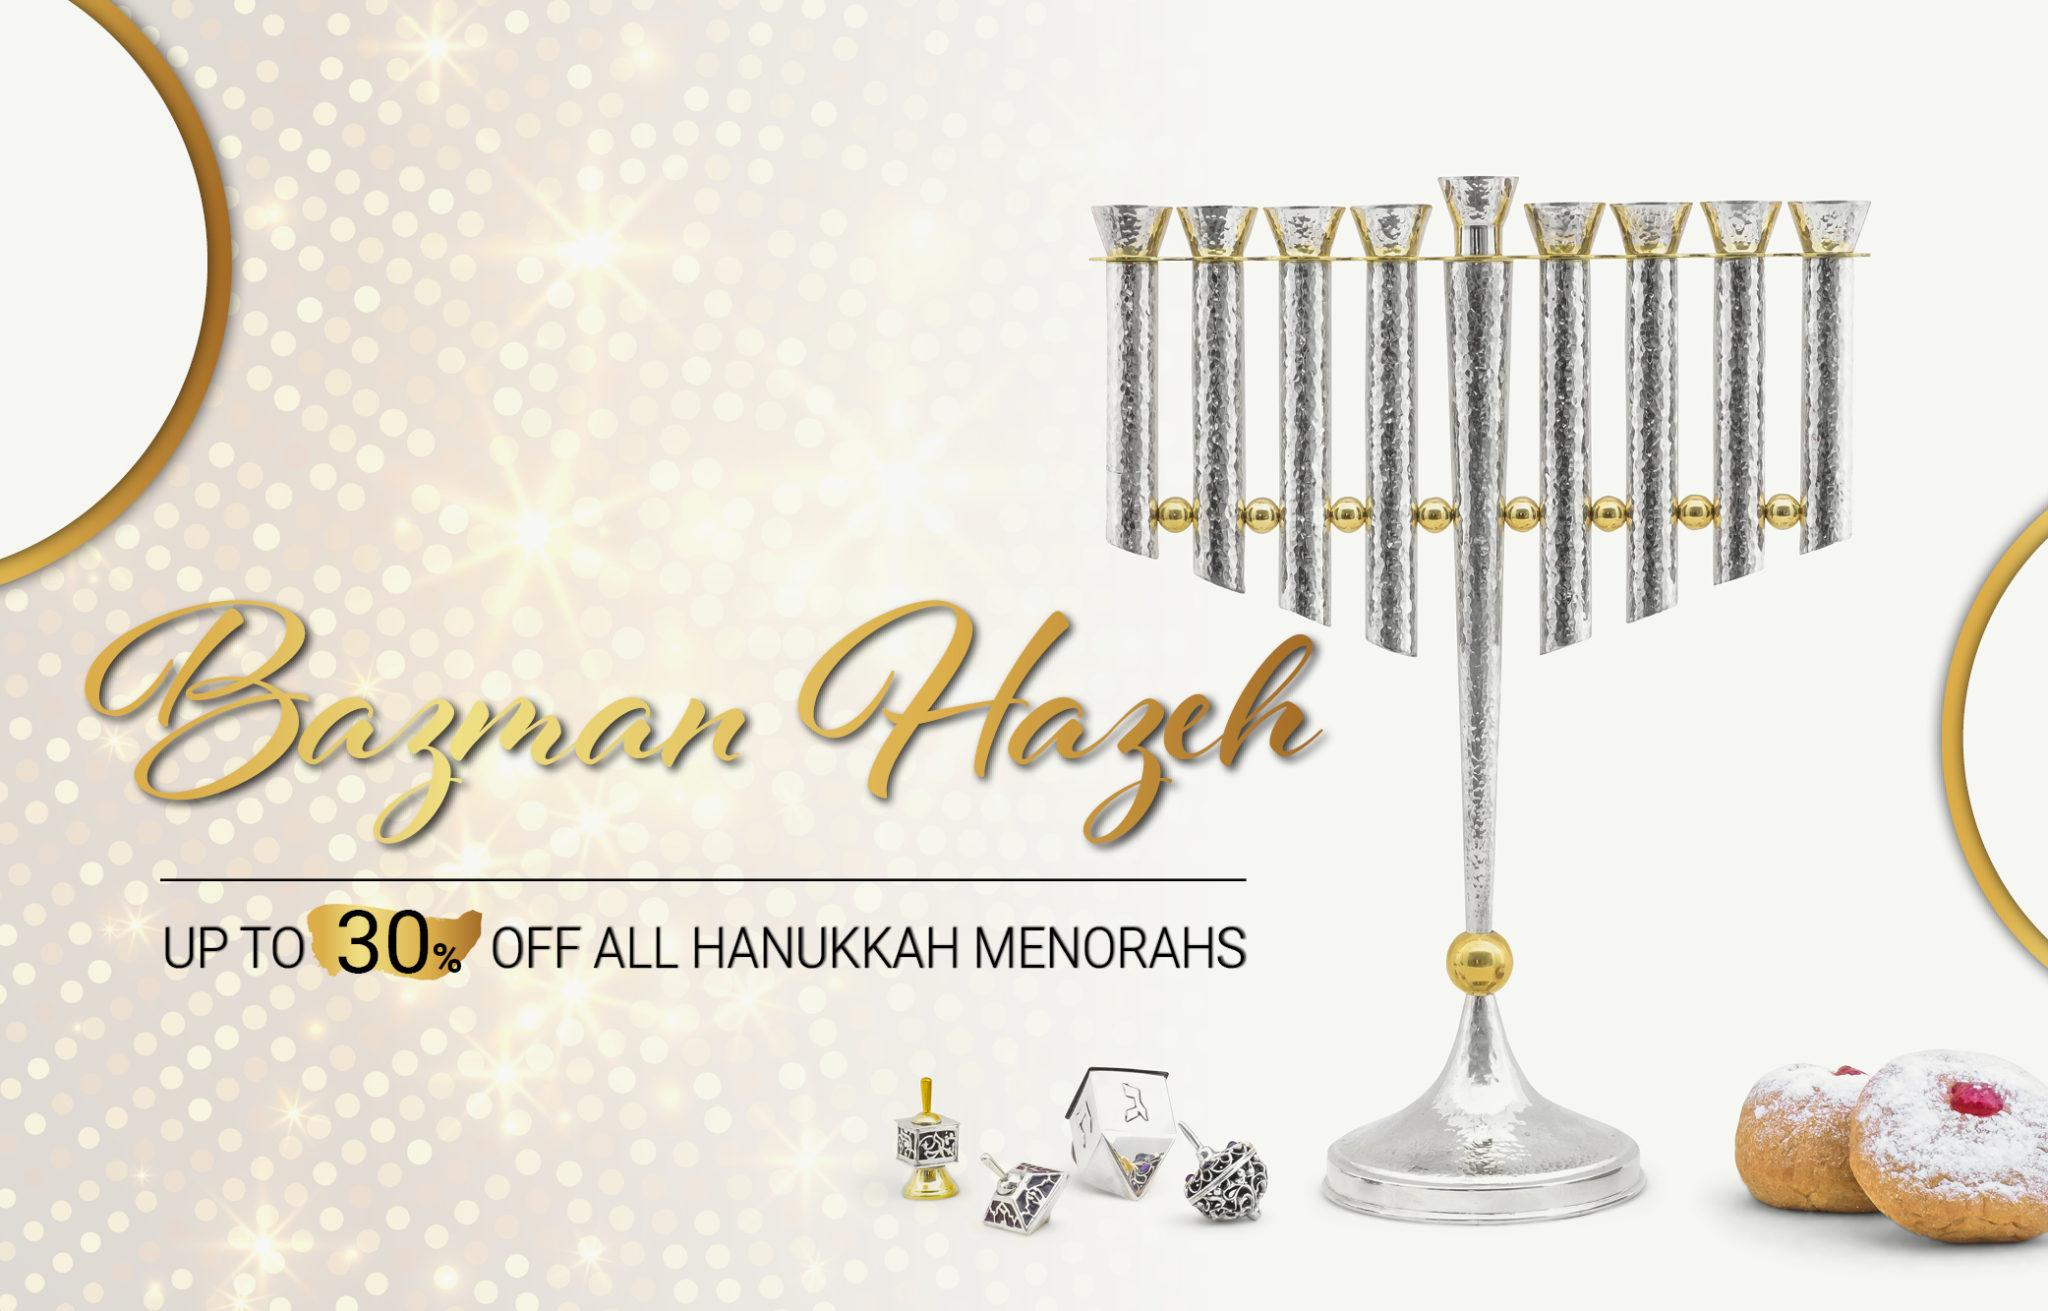 Home Nadav Art Silver Judaica tableware gifts - NADAV ART